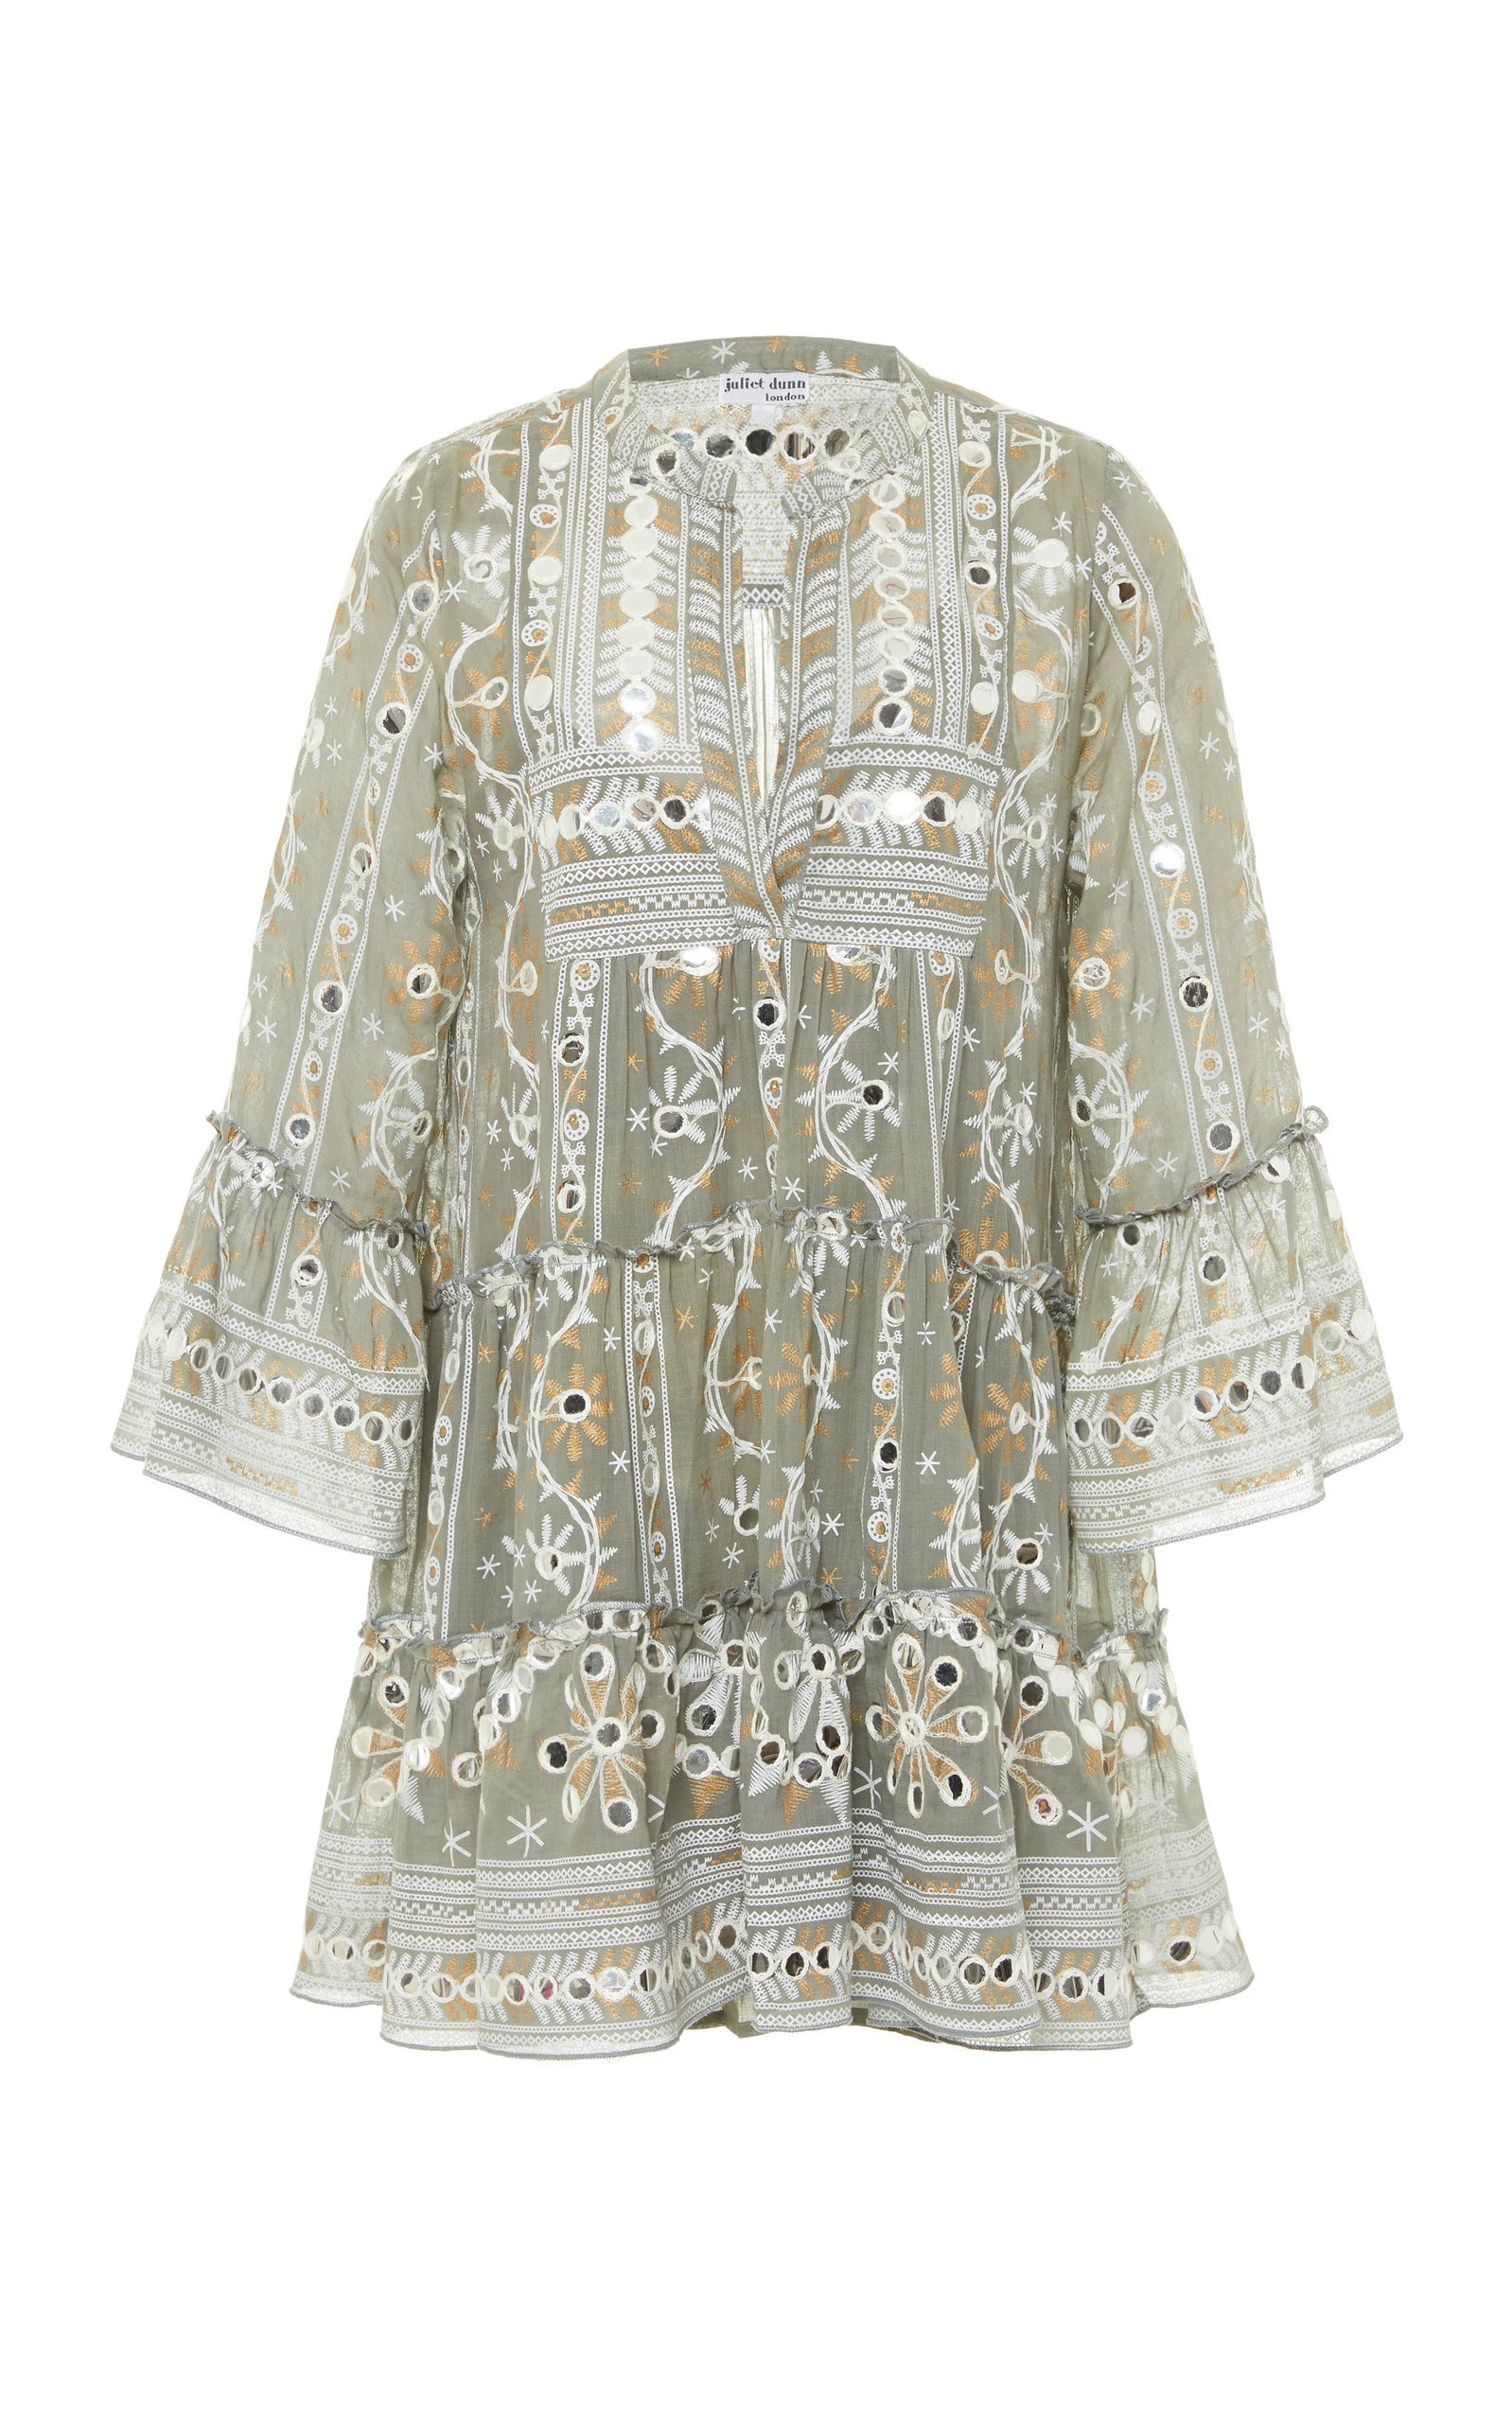 Buy Juliet Dunn Embellished Printed Cotton Mini Dress online, shop Juliet Dunn at the best price